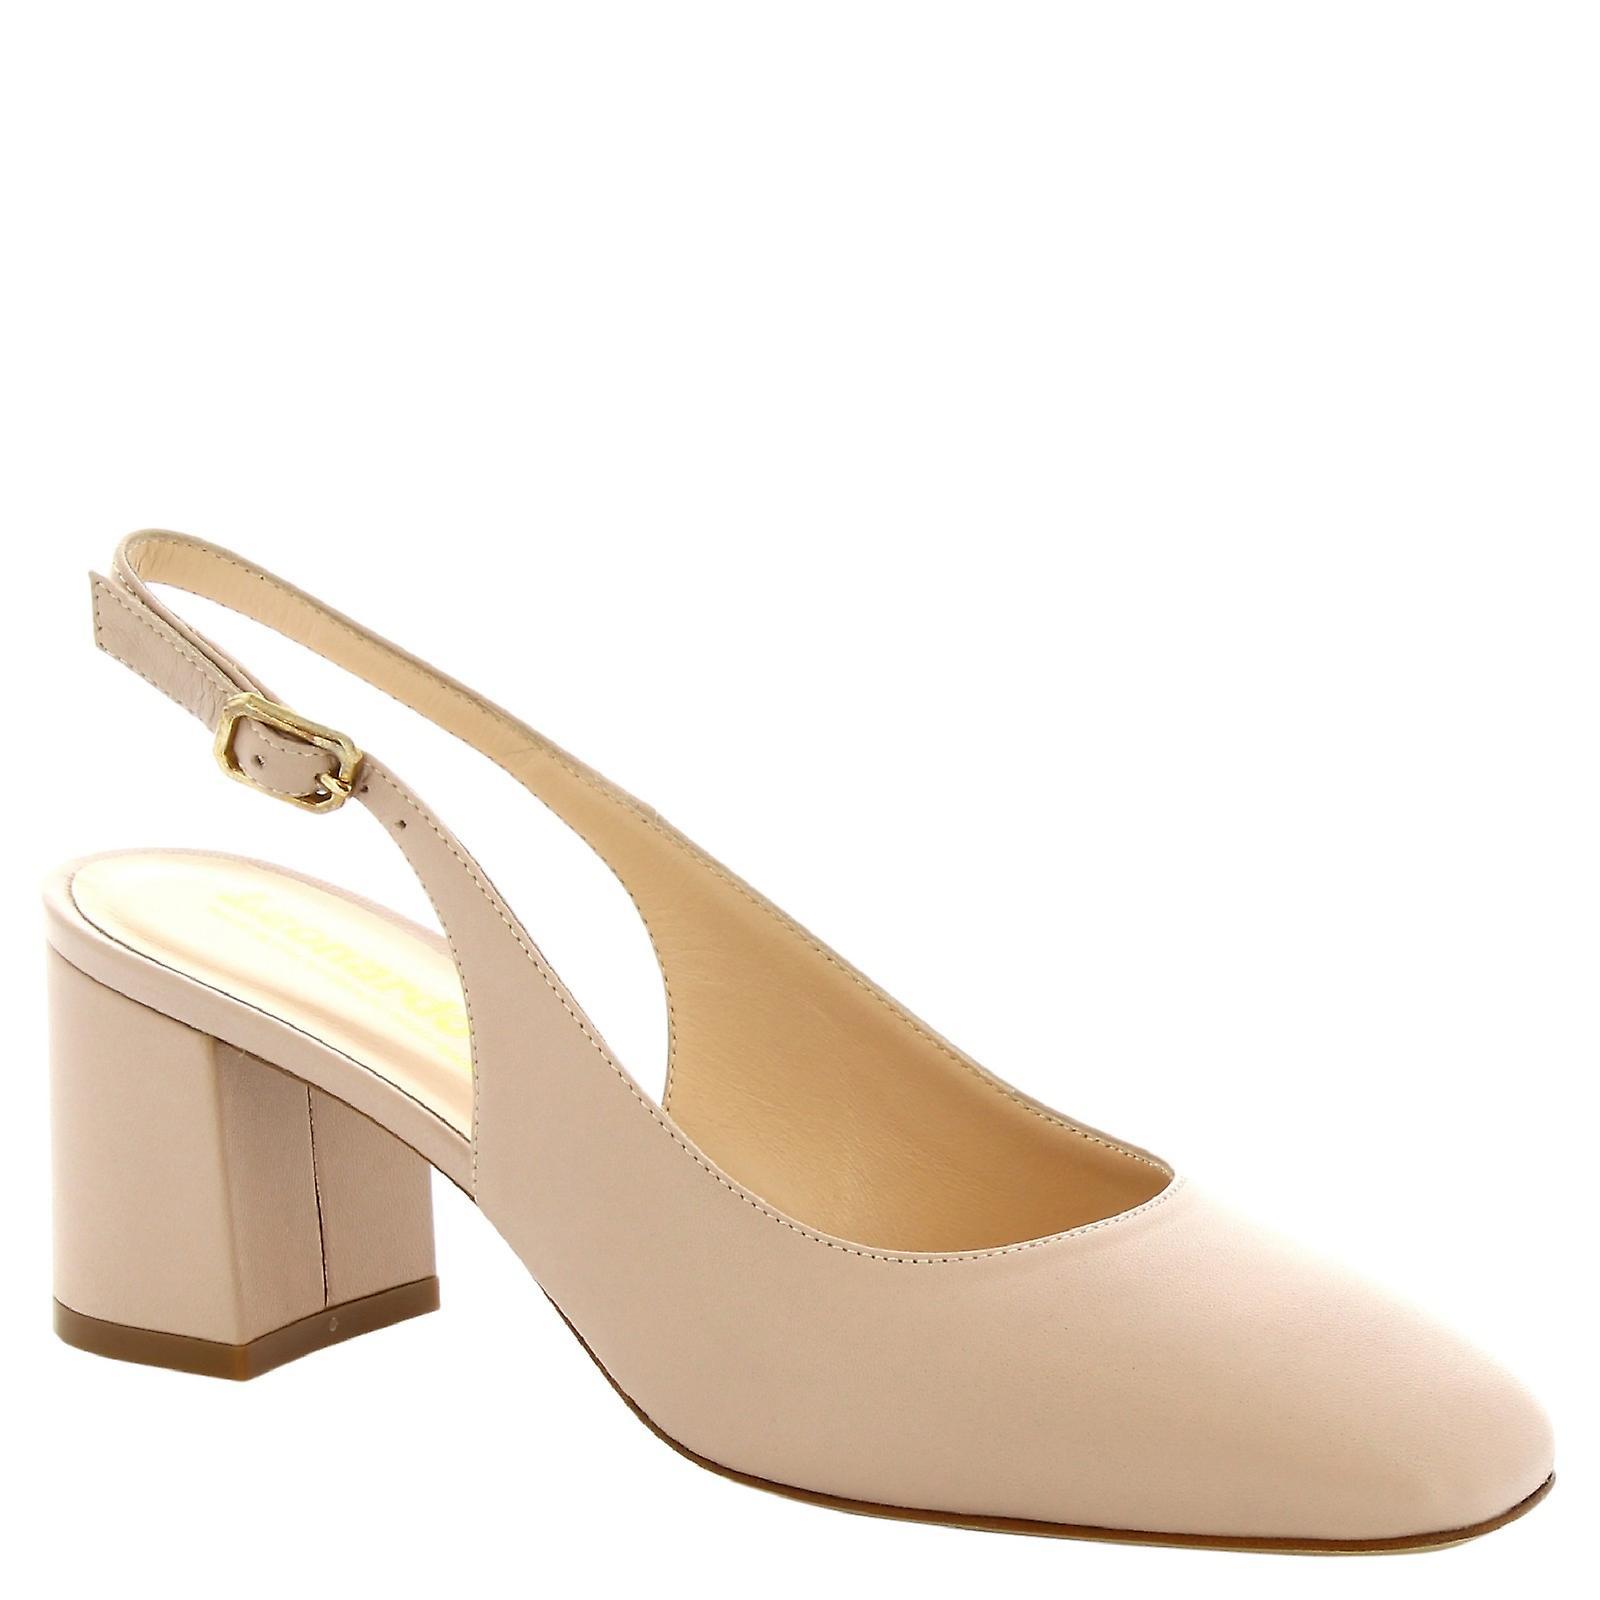 Women's handmade square toe slingback shoes in beige calf leather 6 cm 2sBDi